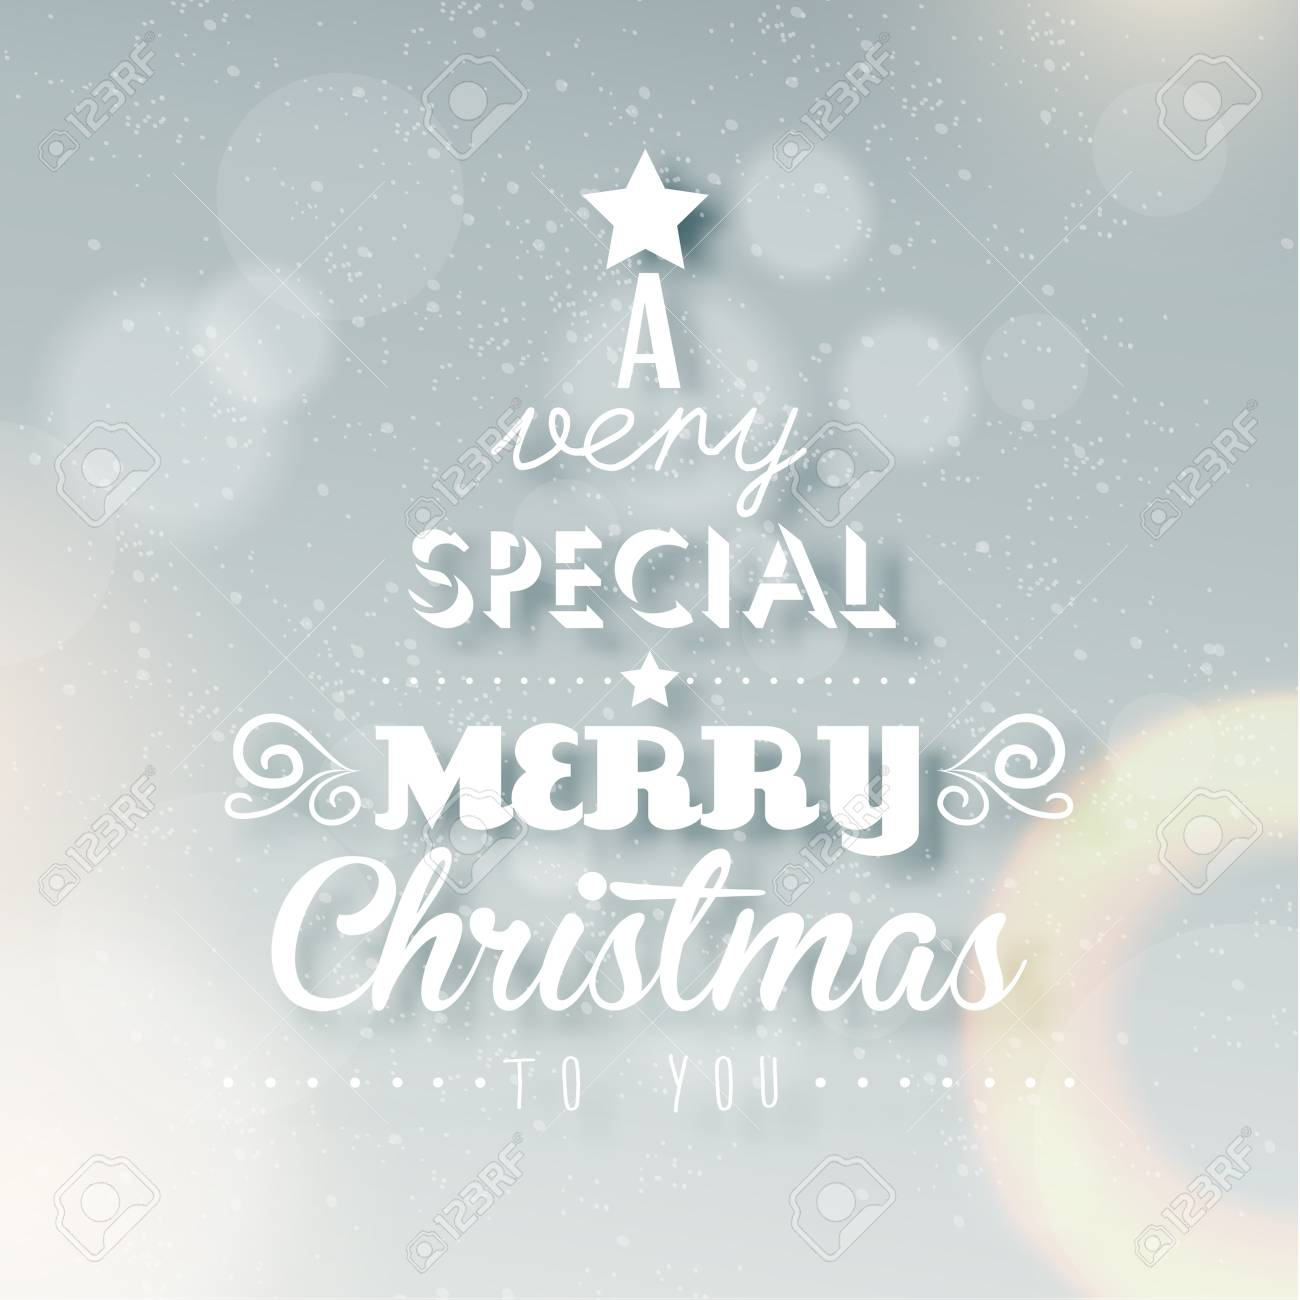 Merry christmas season greetings quote vector design royalty free merry christmas season greetings quote vector design stock vector 33533149 m4hsunfo